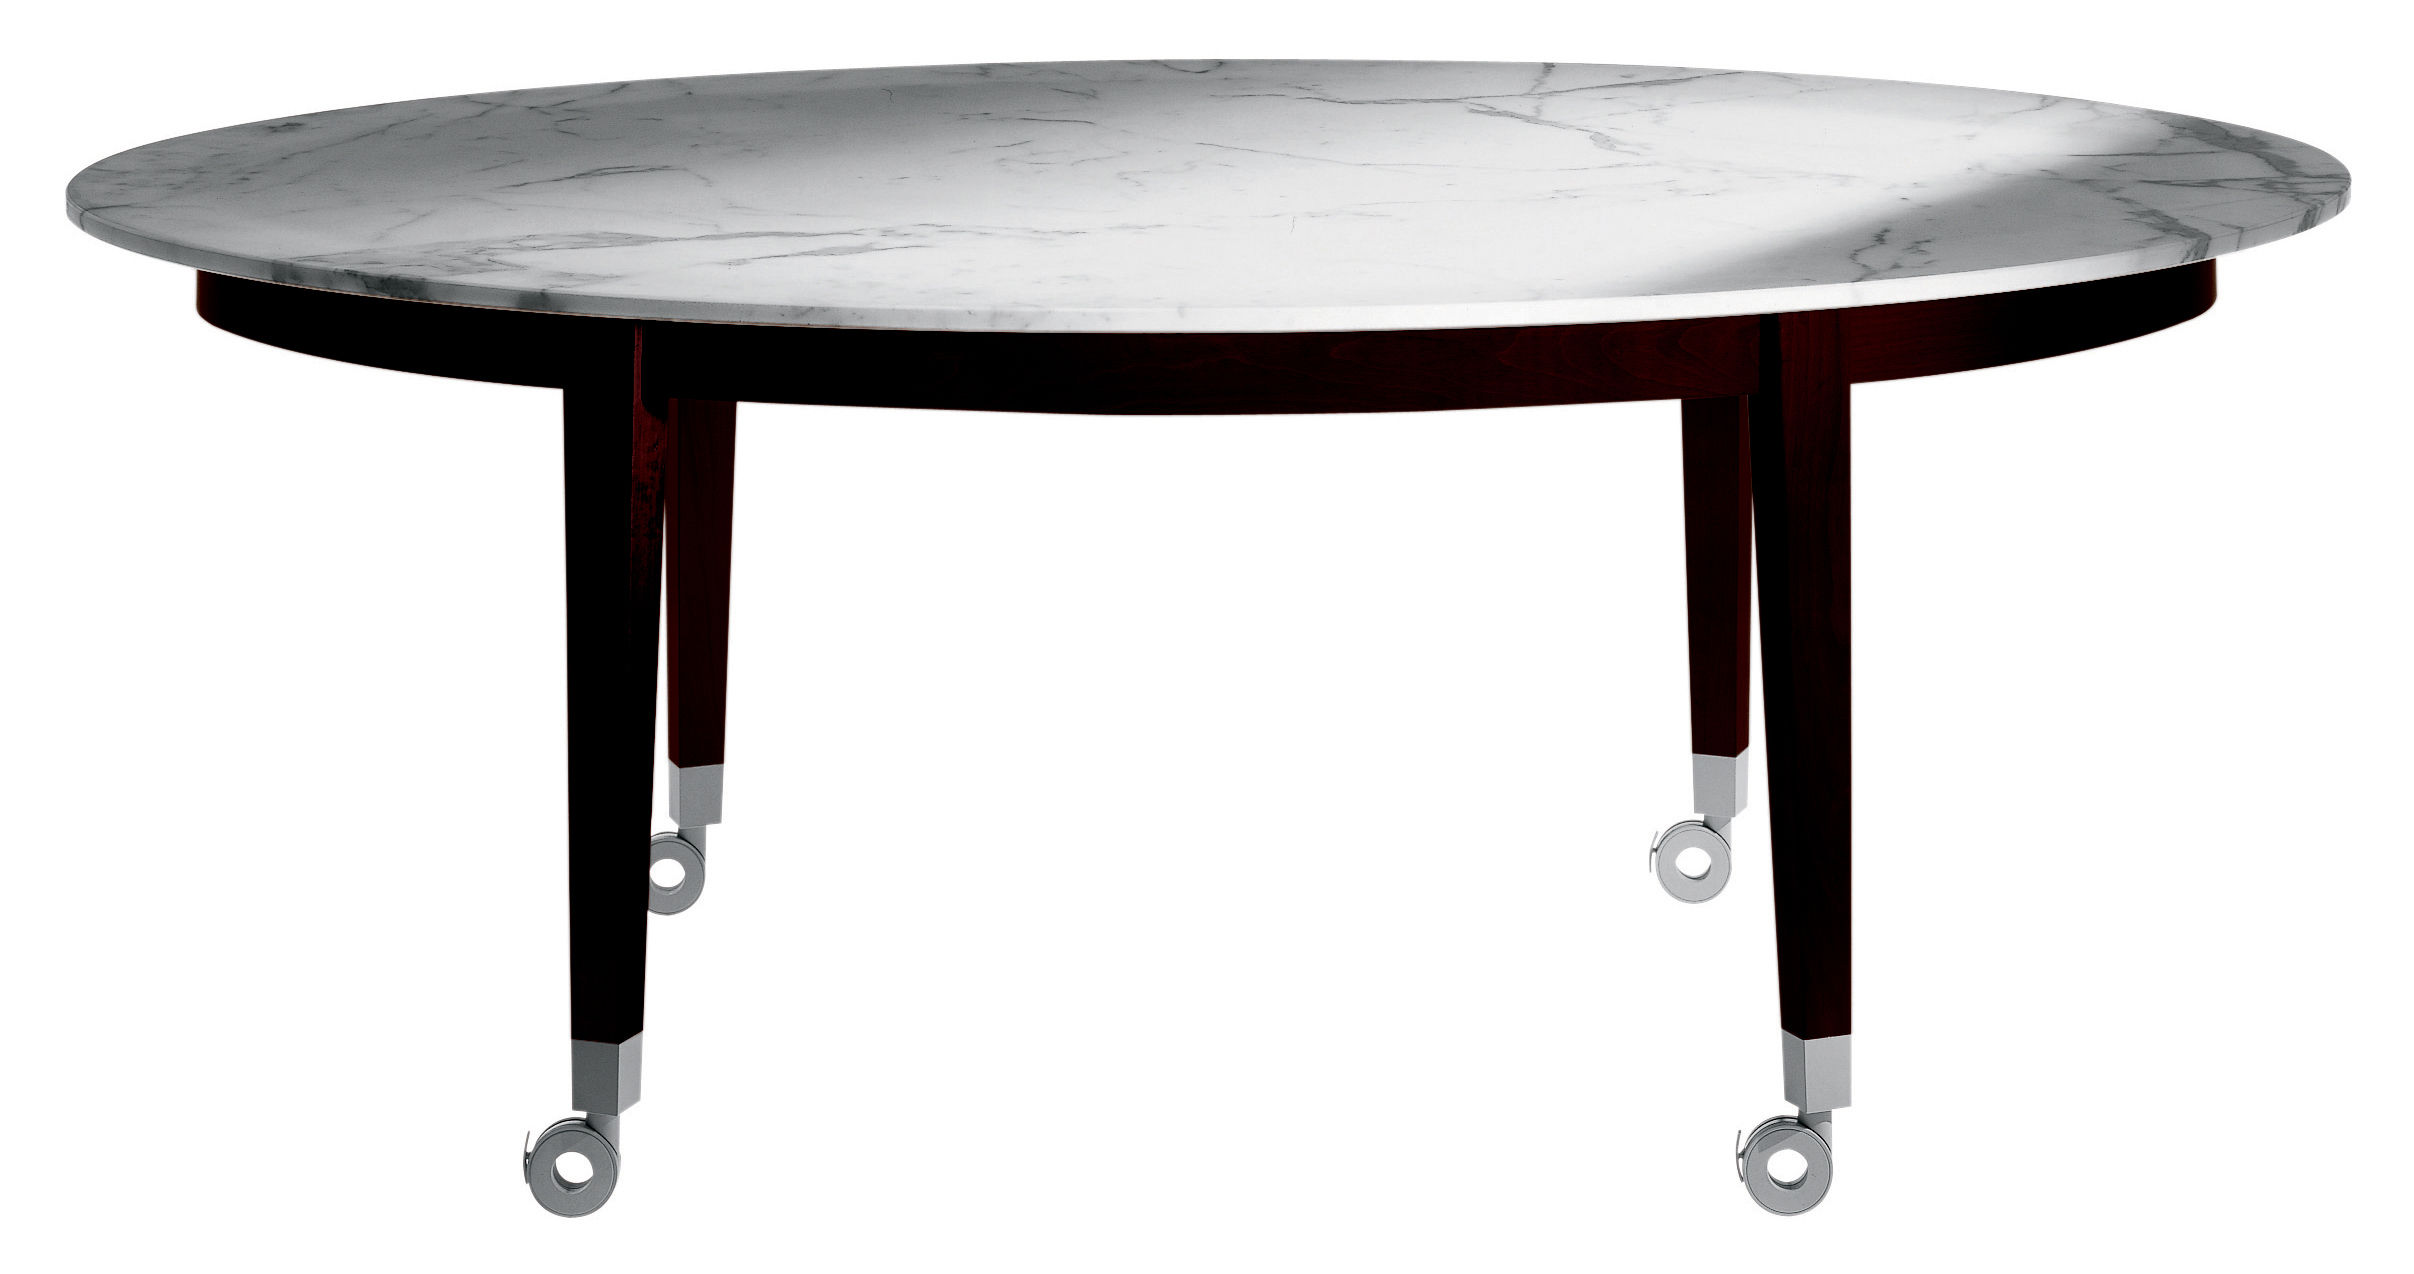 table neoz ovale 190 x 120 cm eb ne marbre driade. Black Bedroom Furniture Sets. Home Design Ideas